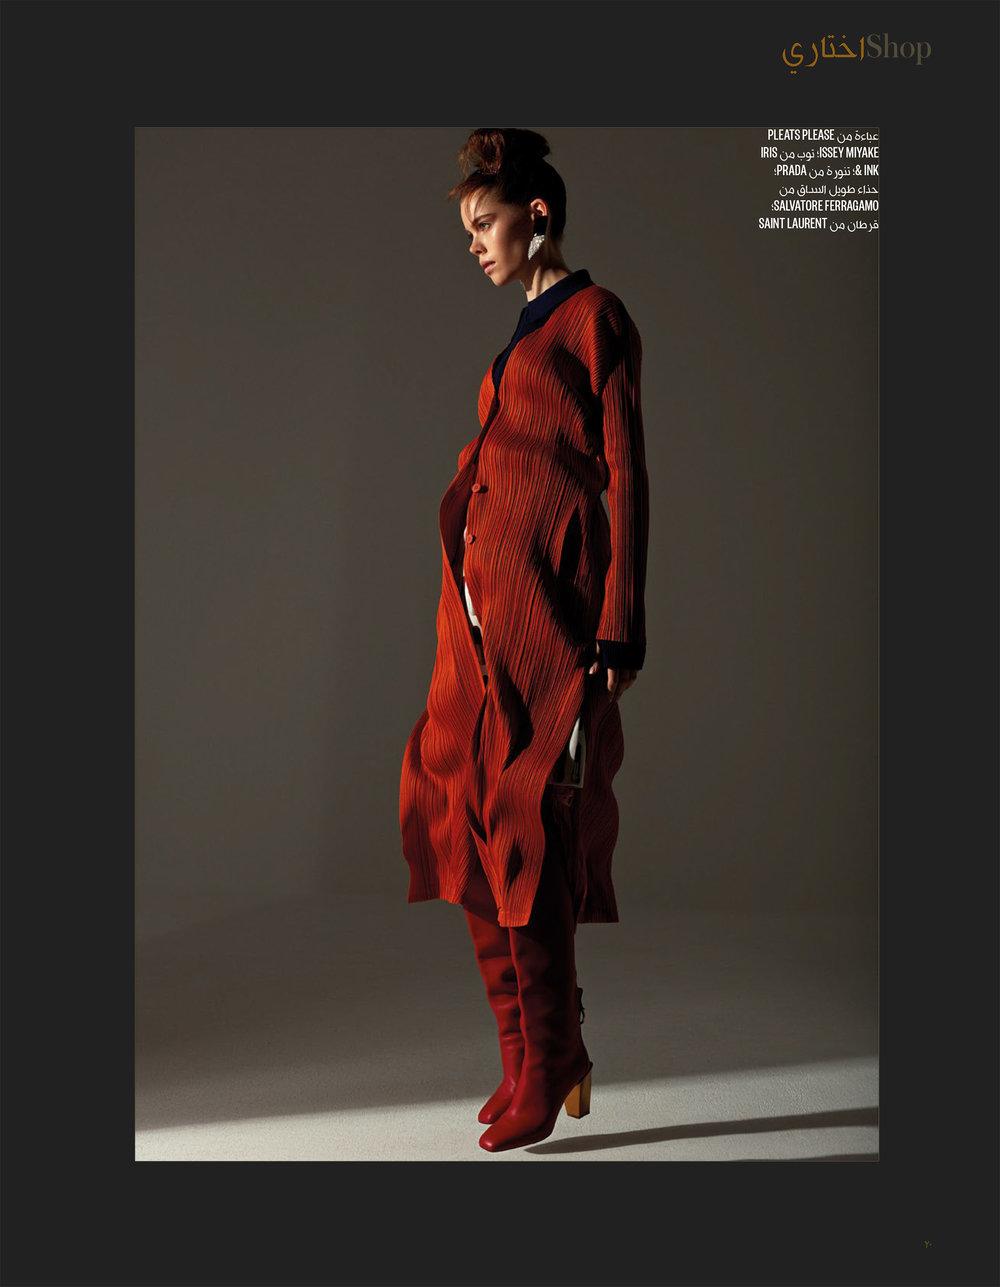 Vogue October Binder_Magzter (dragged)-7.jpg